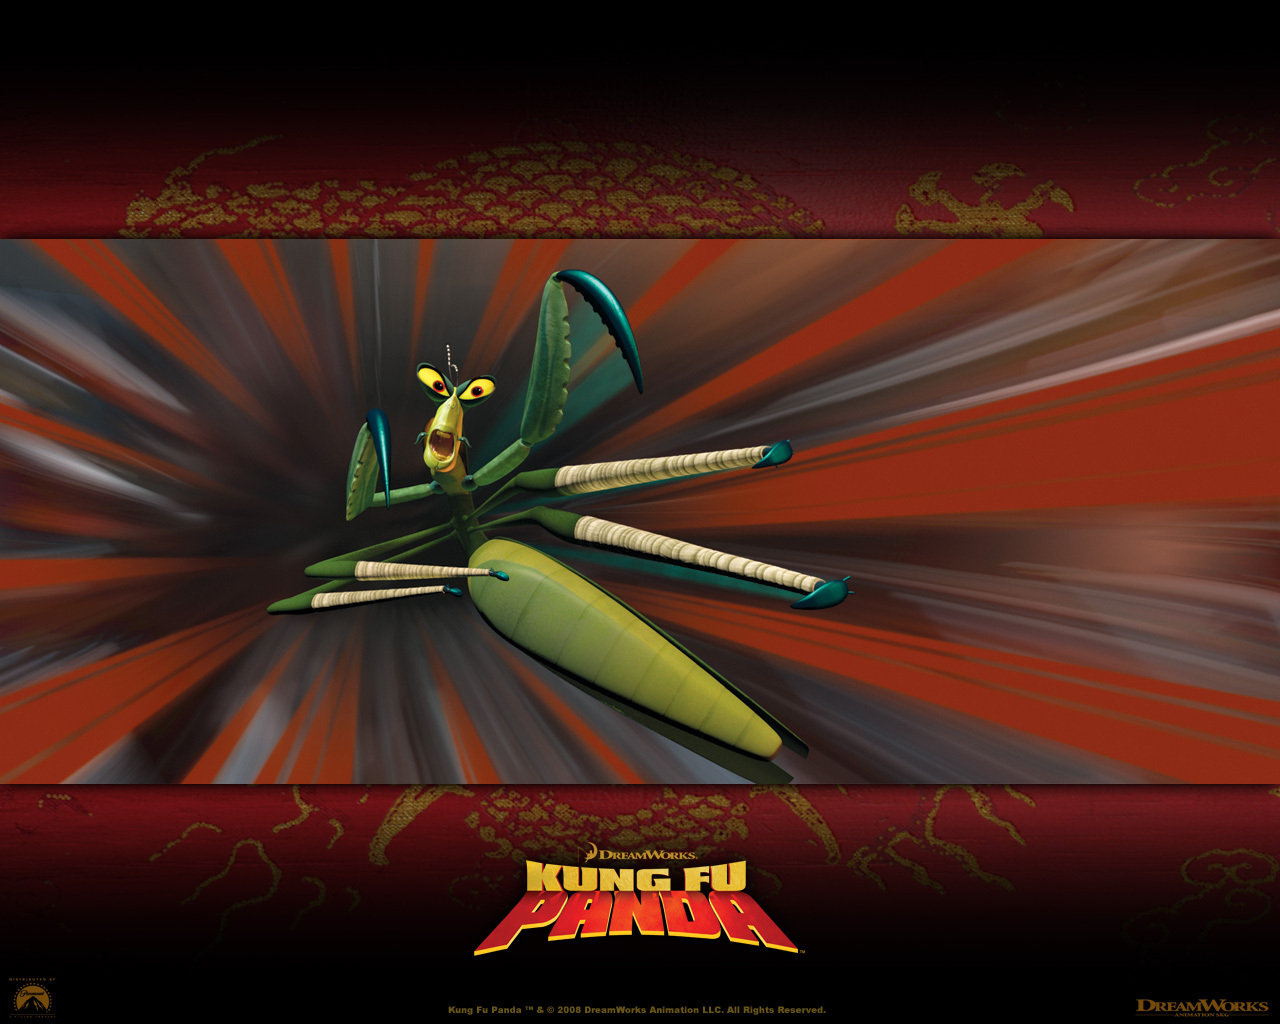 Mantis - Kung Fu Panda Wallpaper (1543073) - Fanpop: www.fanpop.com/clubs/kung-fu-panda/images/1543073/title/mantis...